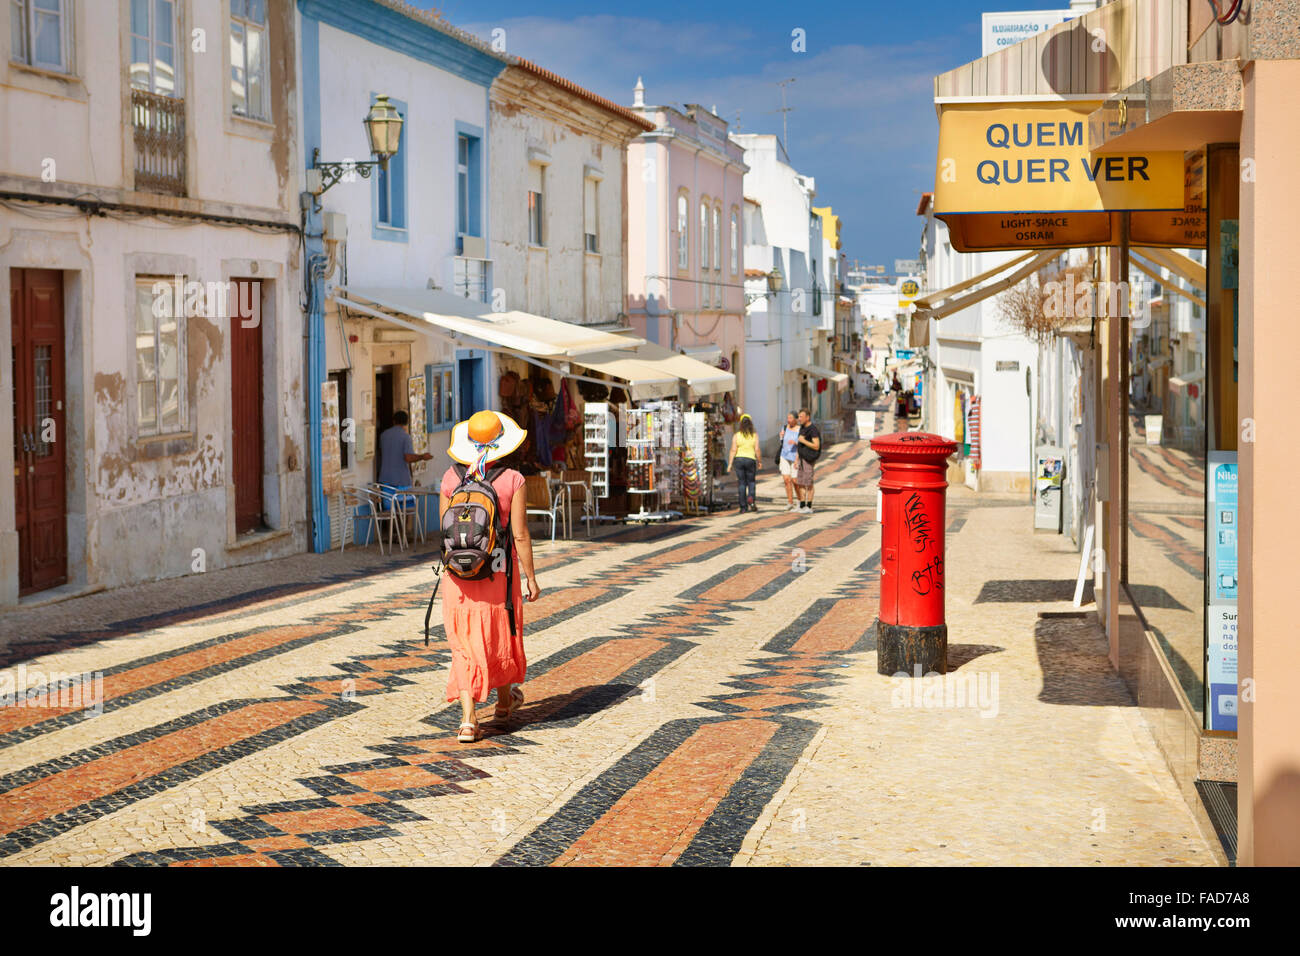 Lagos old town, Rua 25 de Abril, Lagos Municipality, Algarve, Portugal - Stock Image